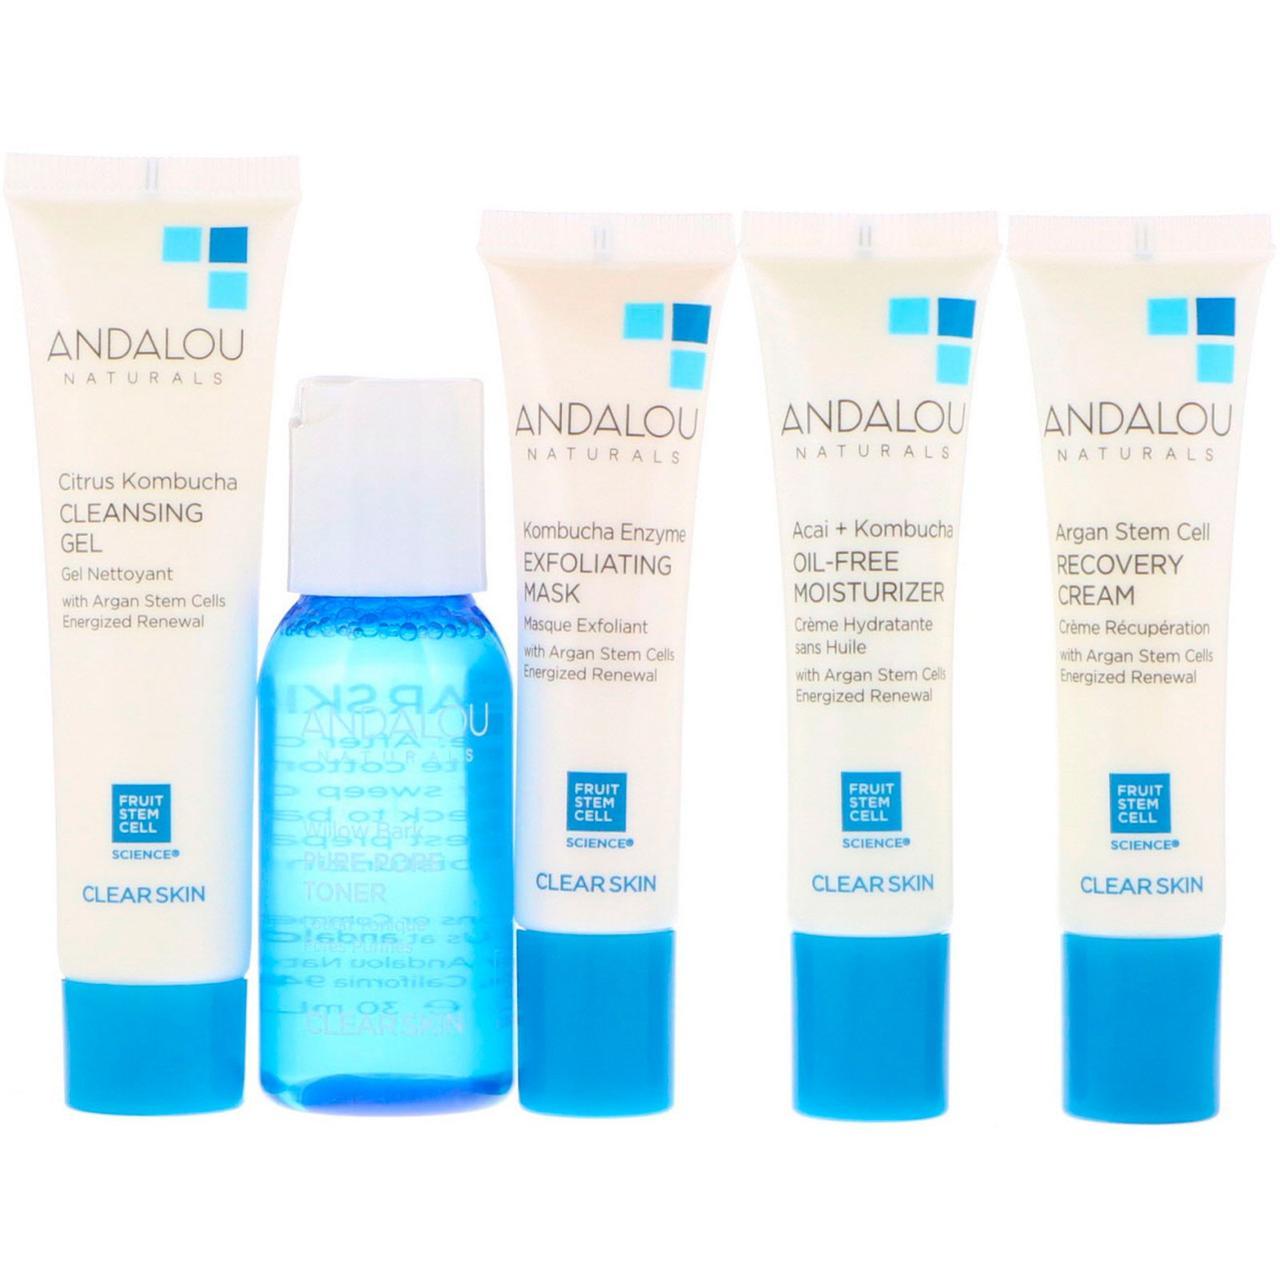 Набір по догляду за обличчям (Skin Care Essentials), Andalou Naturals, 5 шт